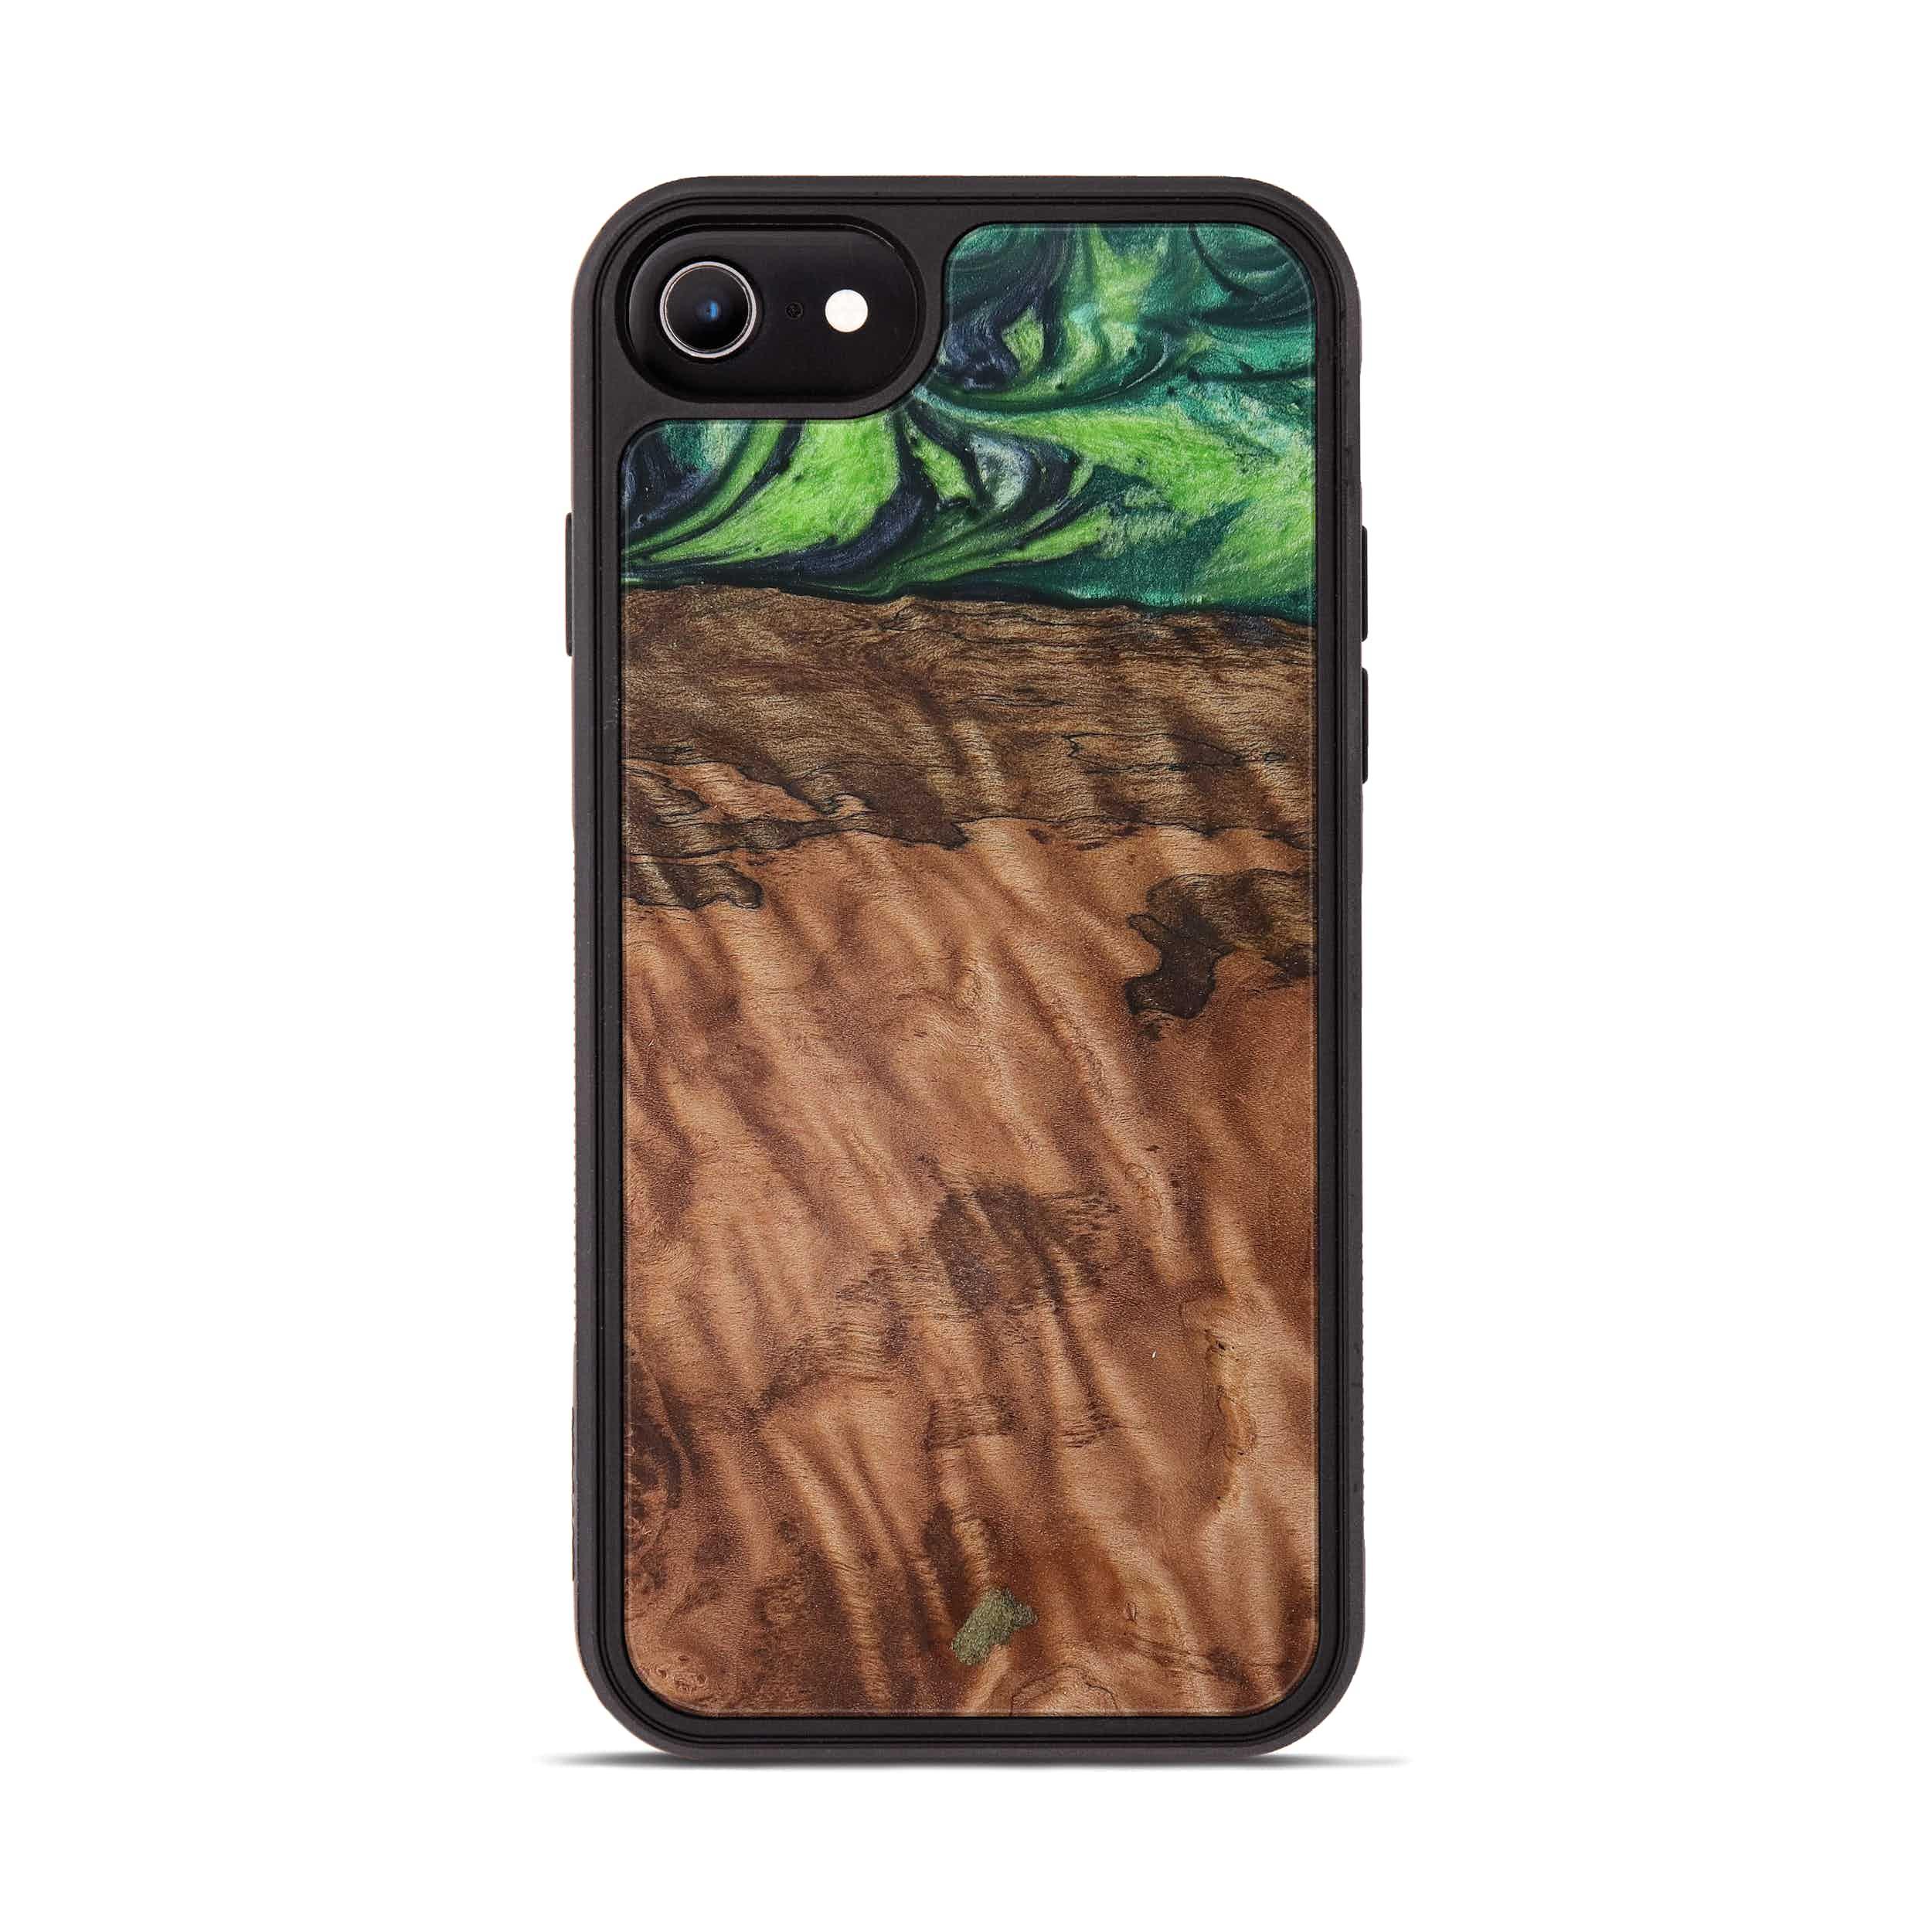 iPhone 6s Wood+Resin Phone Case - Shelton (Dark Green, 387357)